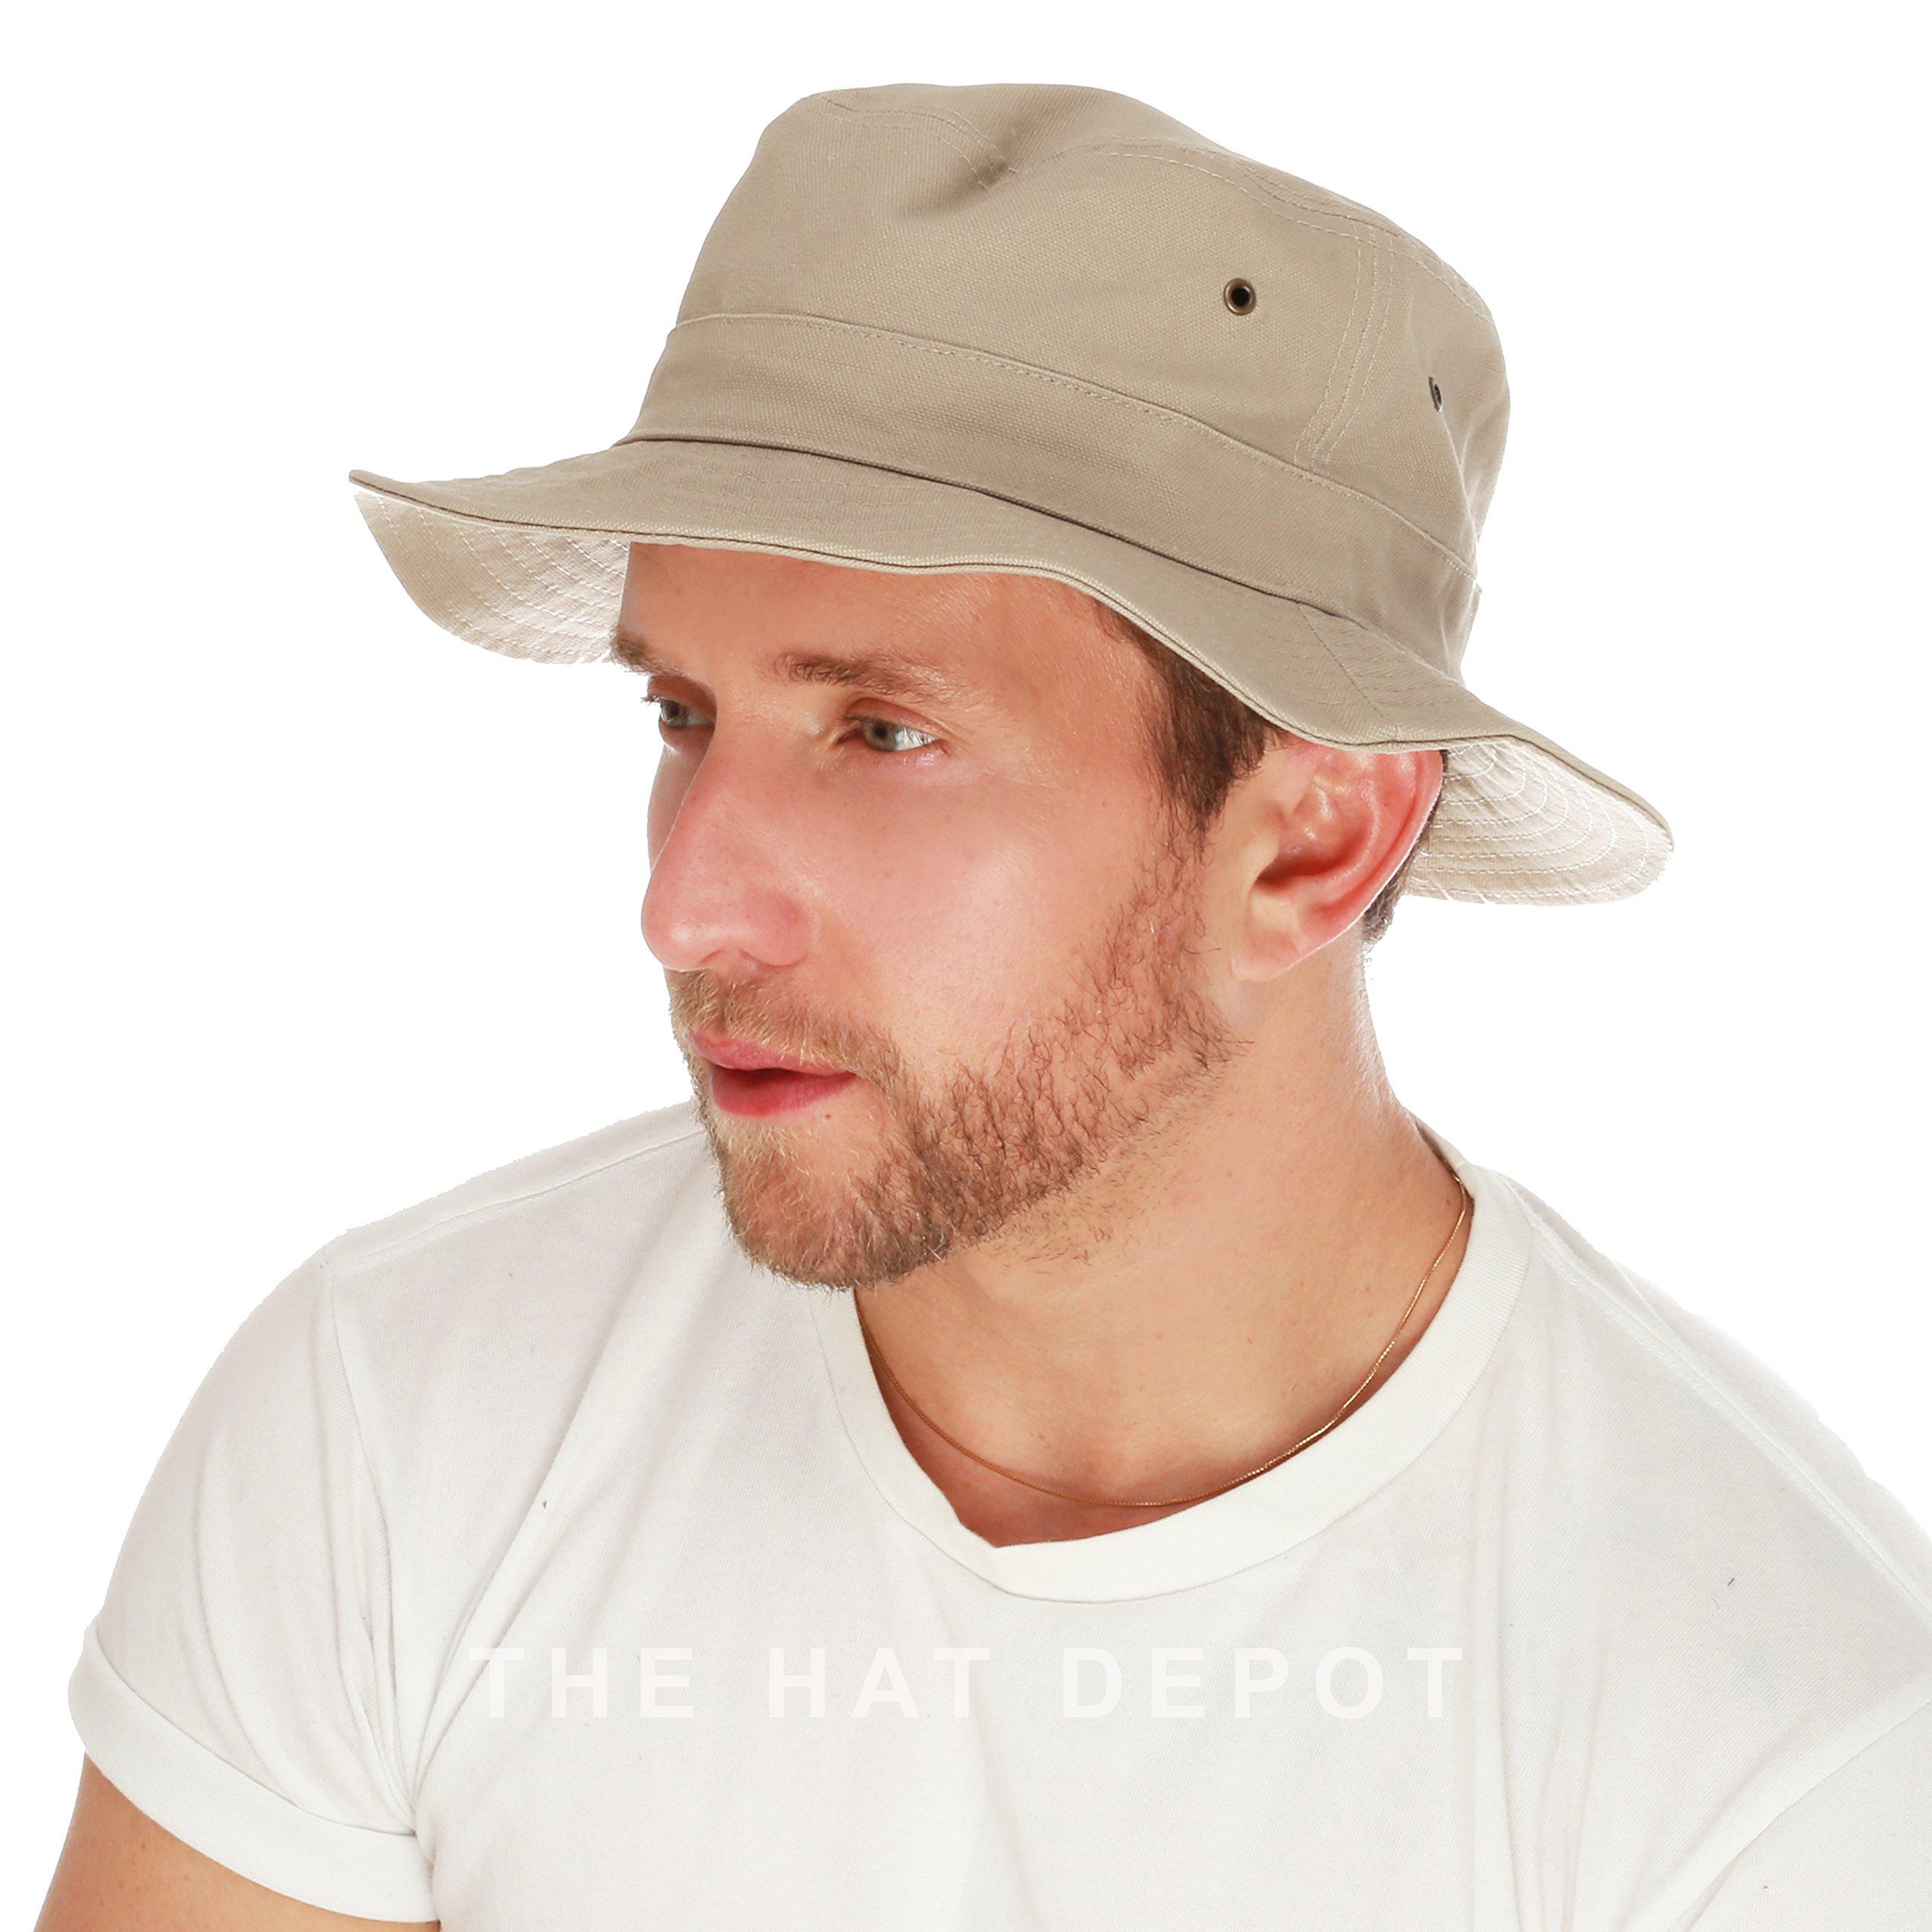 THE HAT DEPOT 100% Cotton Canvas Packable Summer Travel Bucket Hat (L/XL, Khaki)